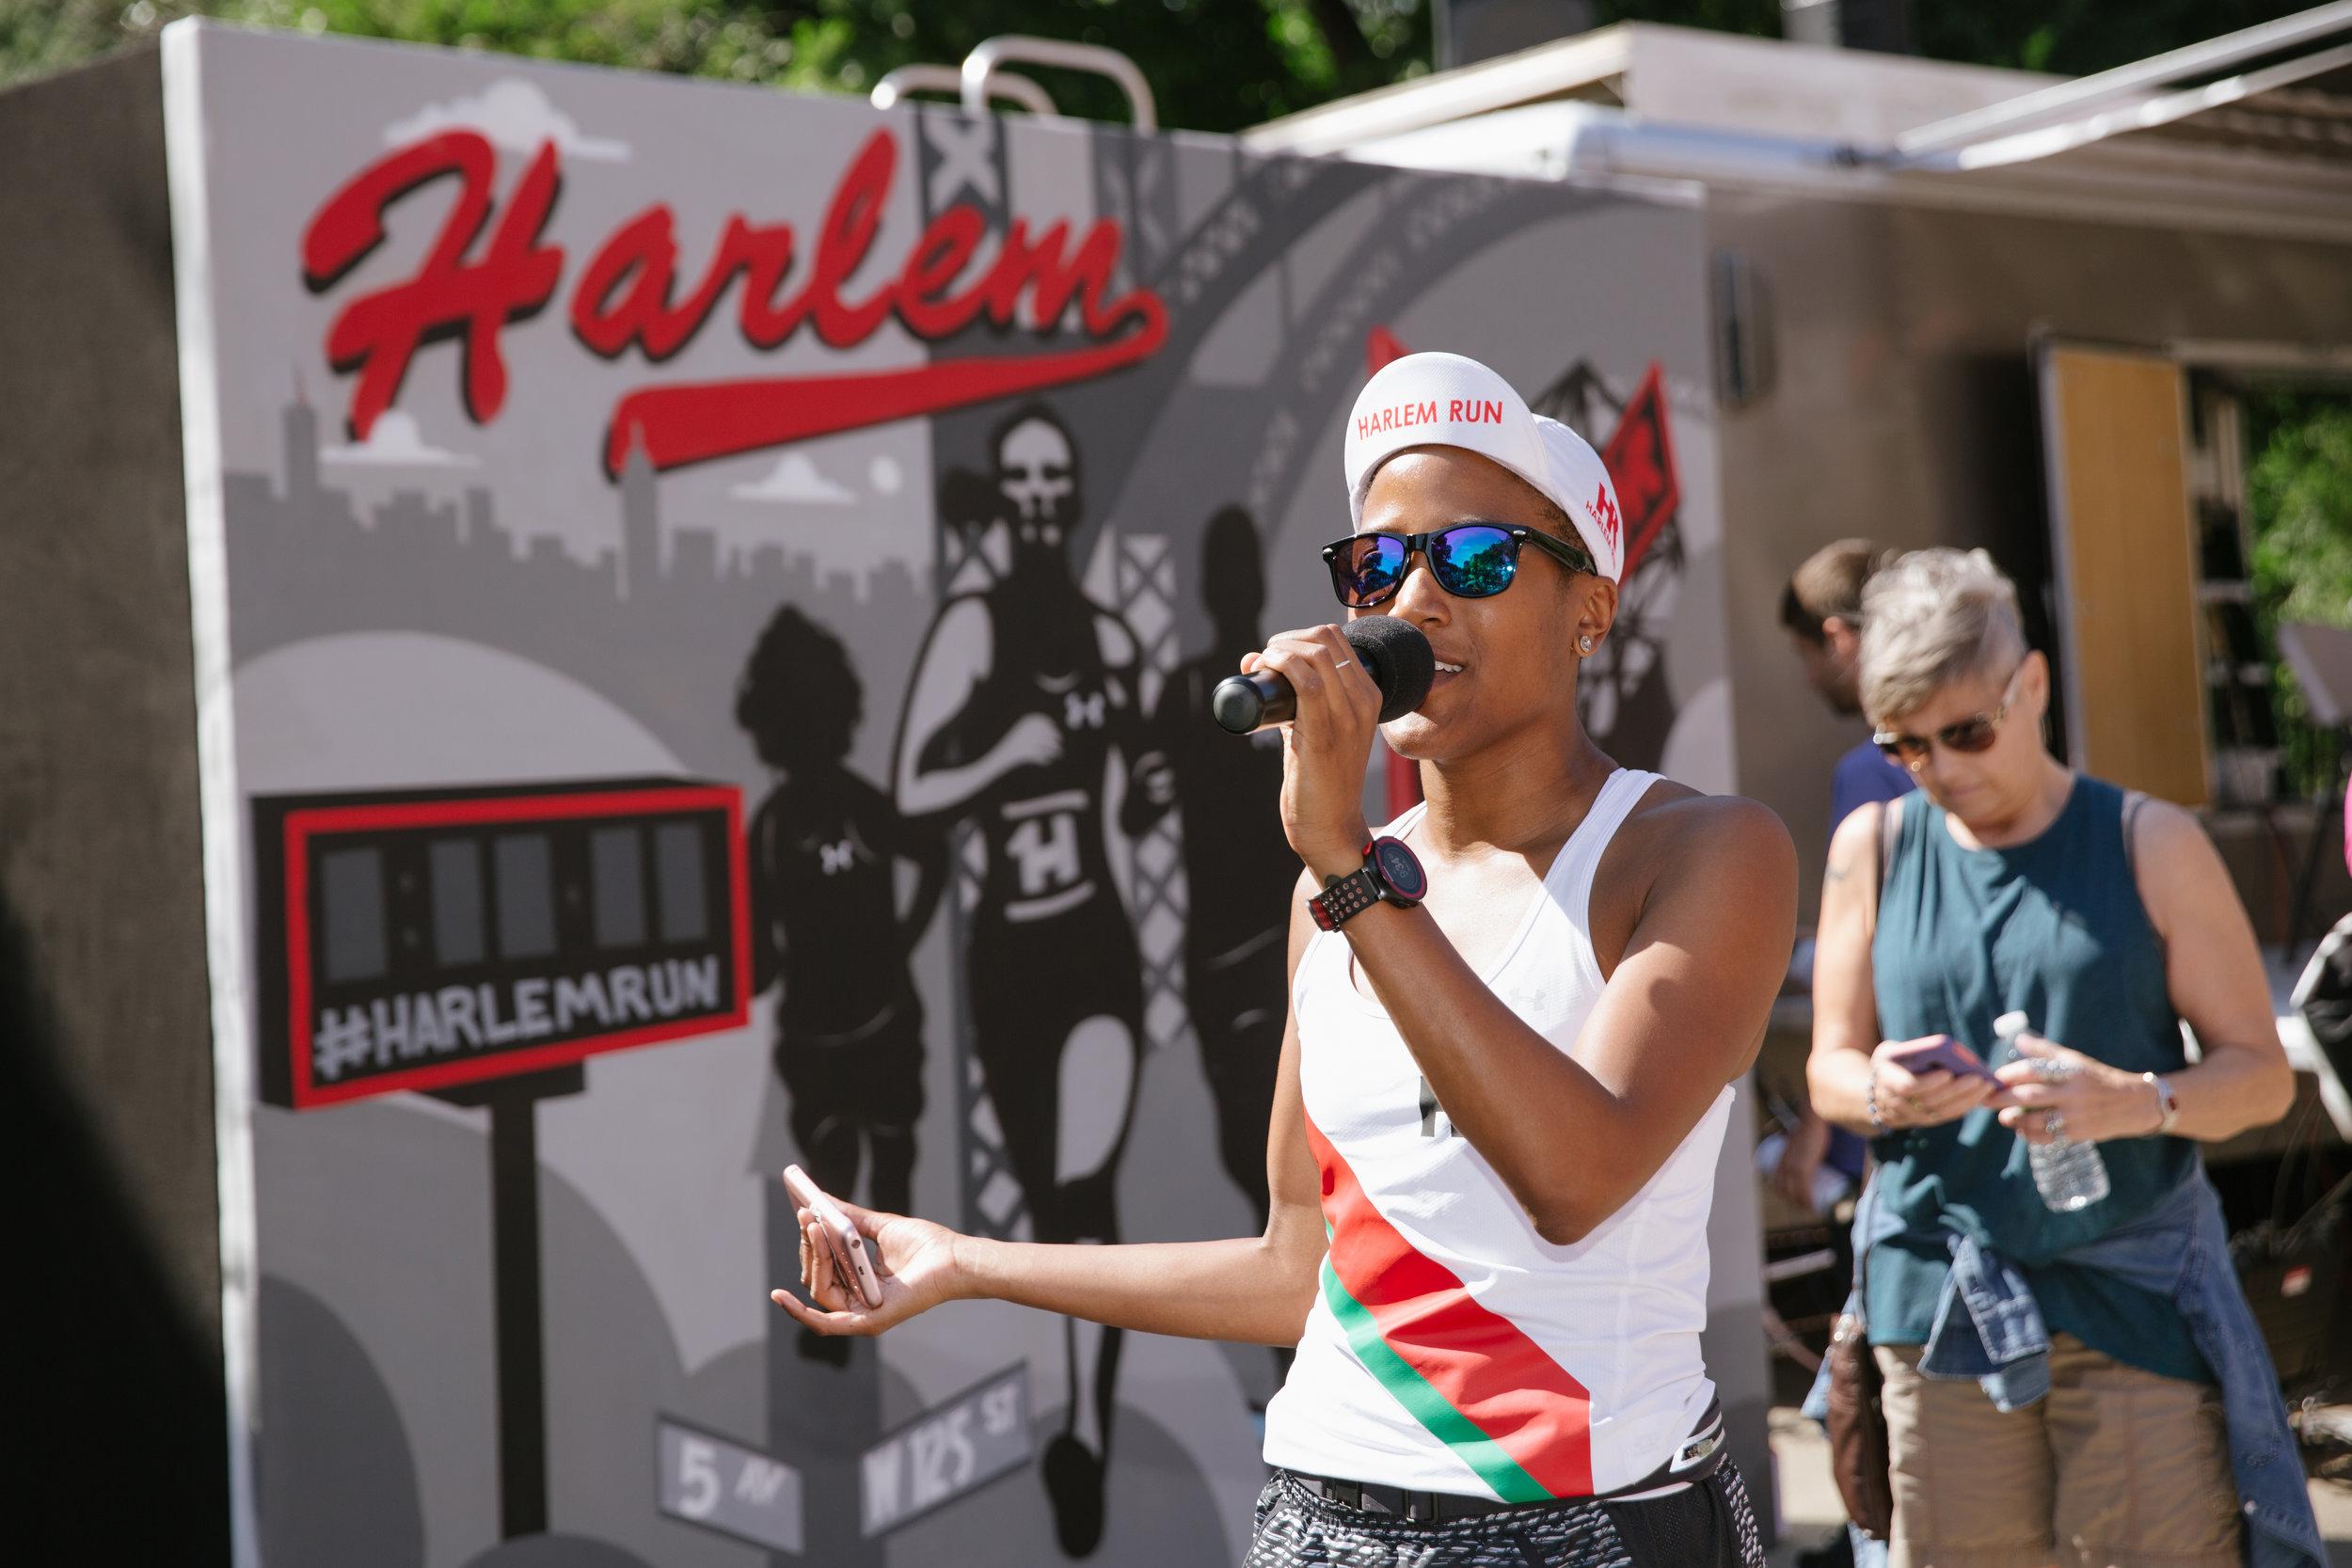 Harlem One Miler 2016-Part 1-0055.jpg